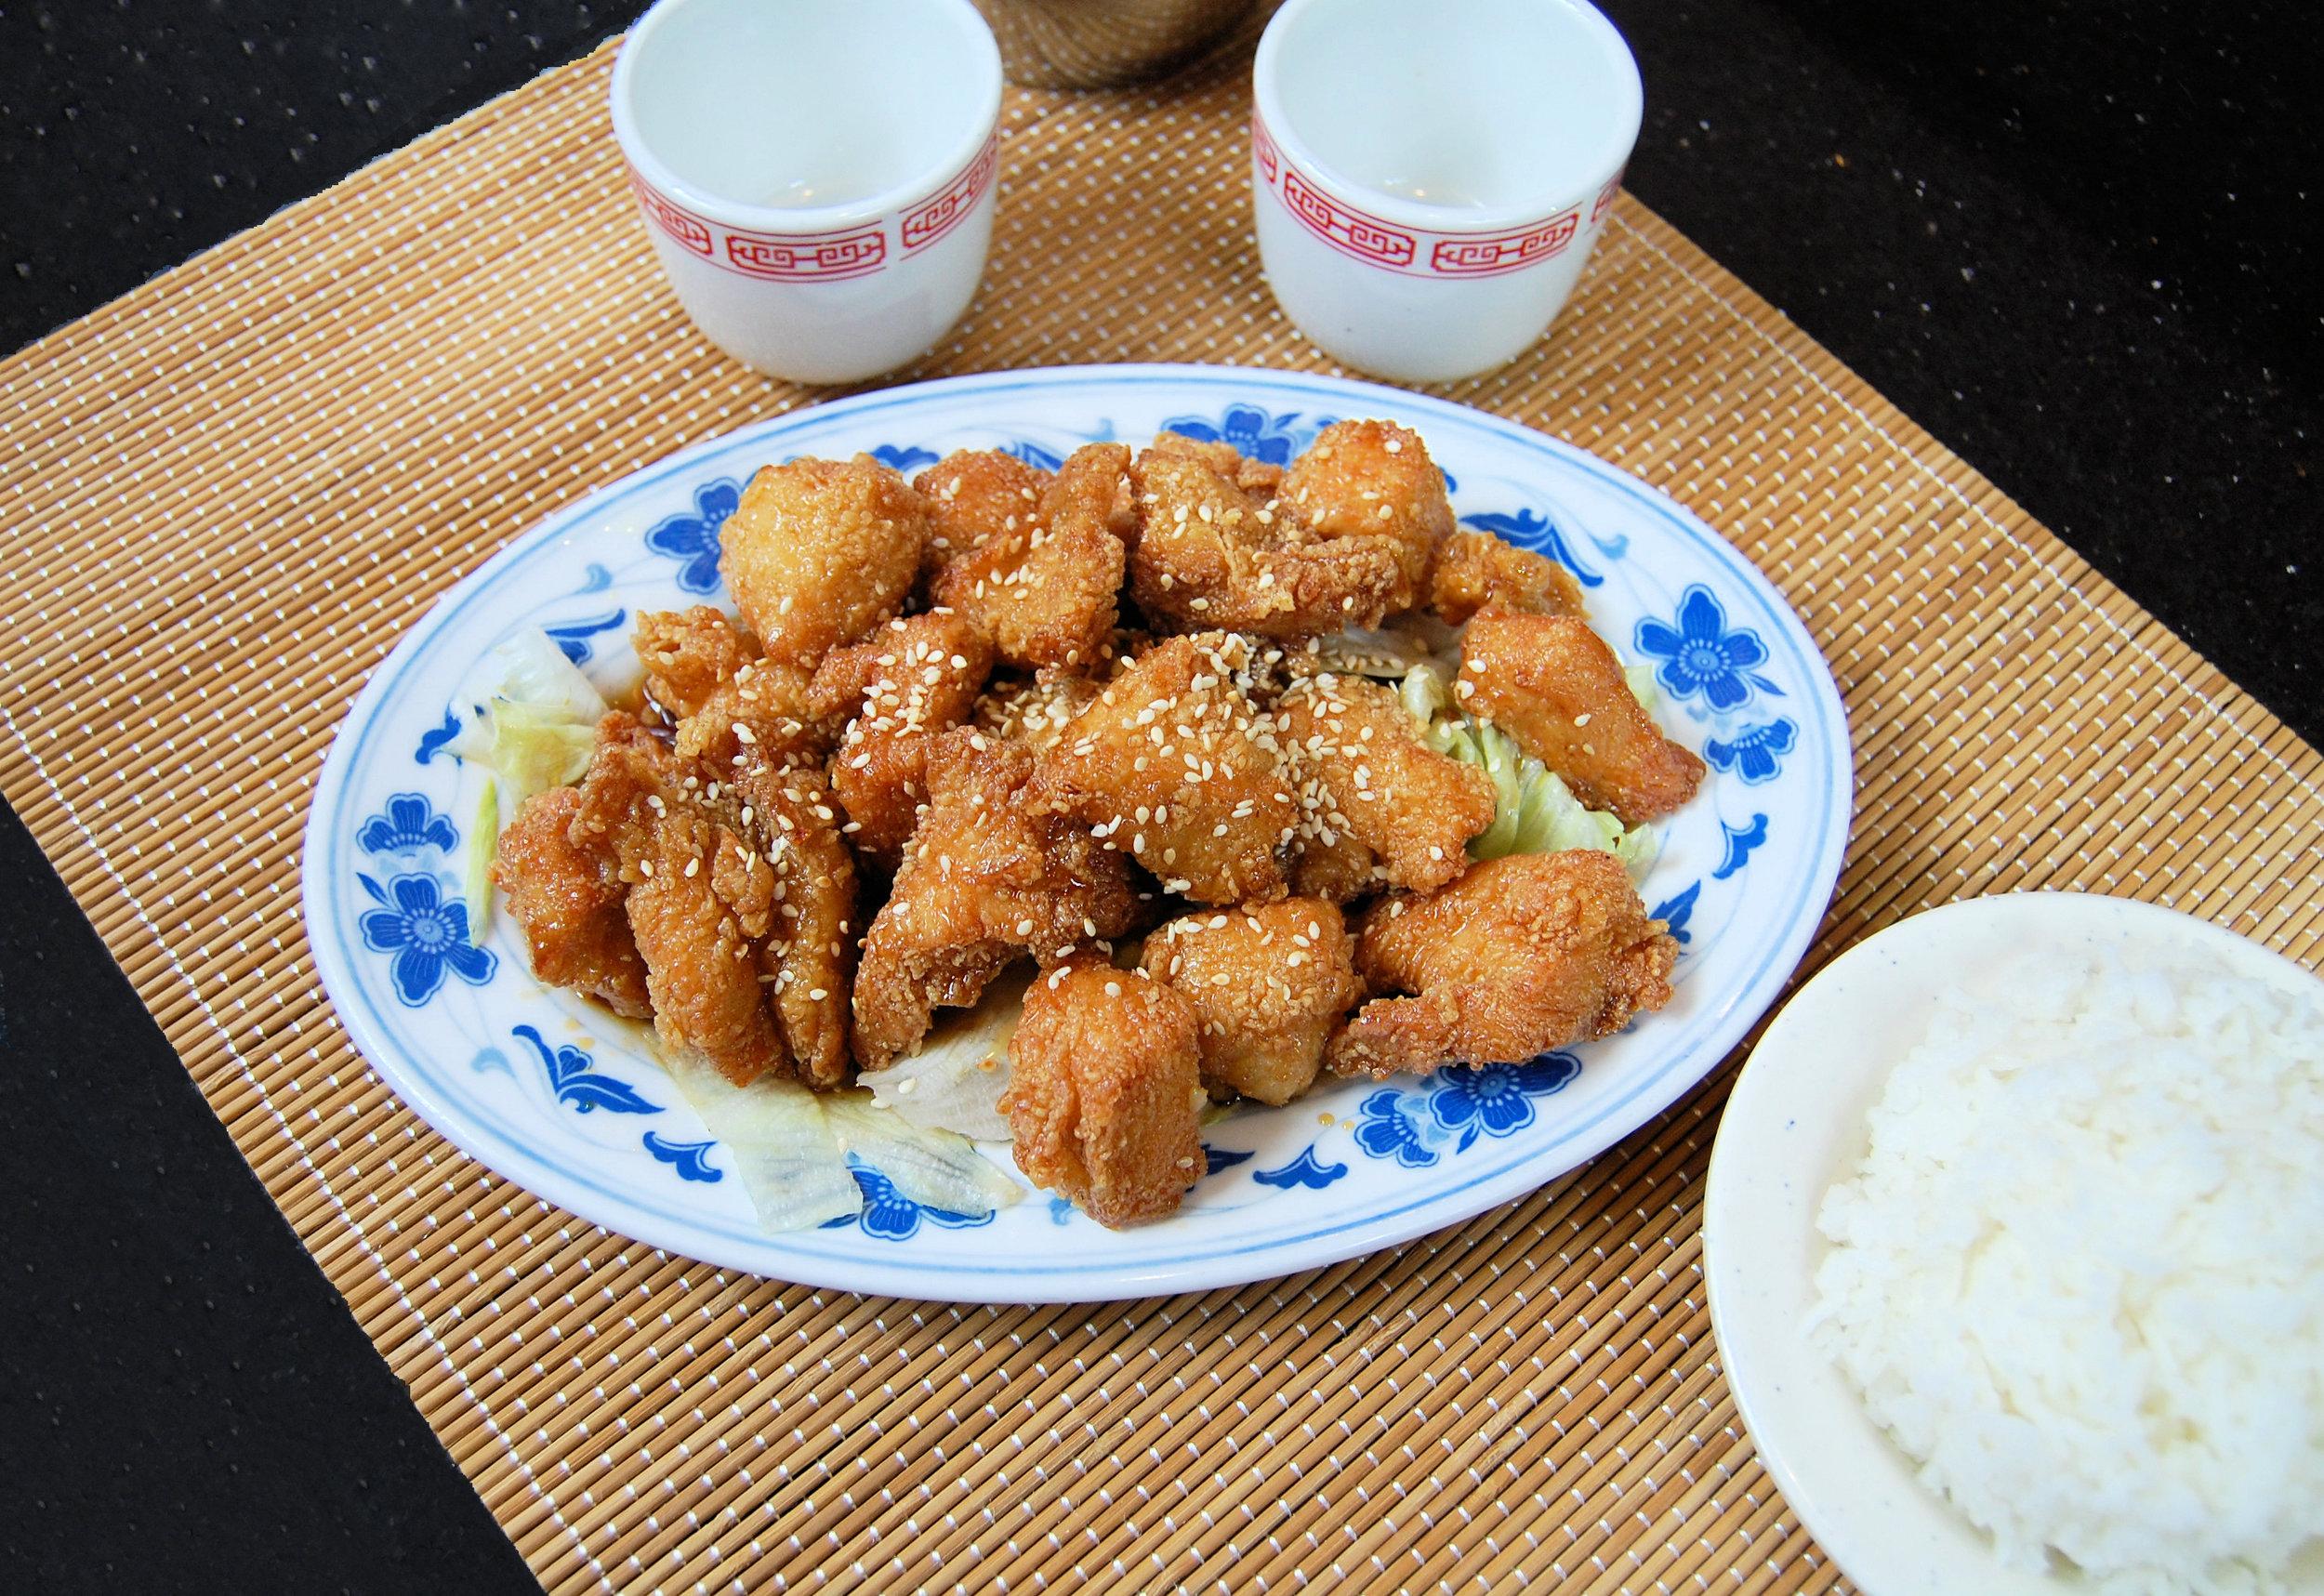 DSC_0543 Seseme Chicken photoshoppede.JPG